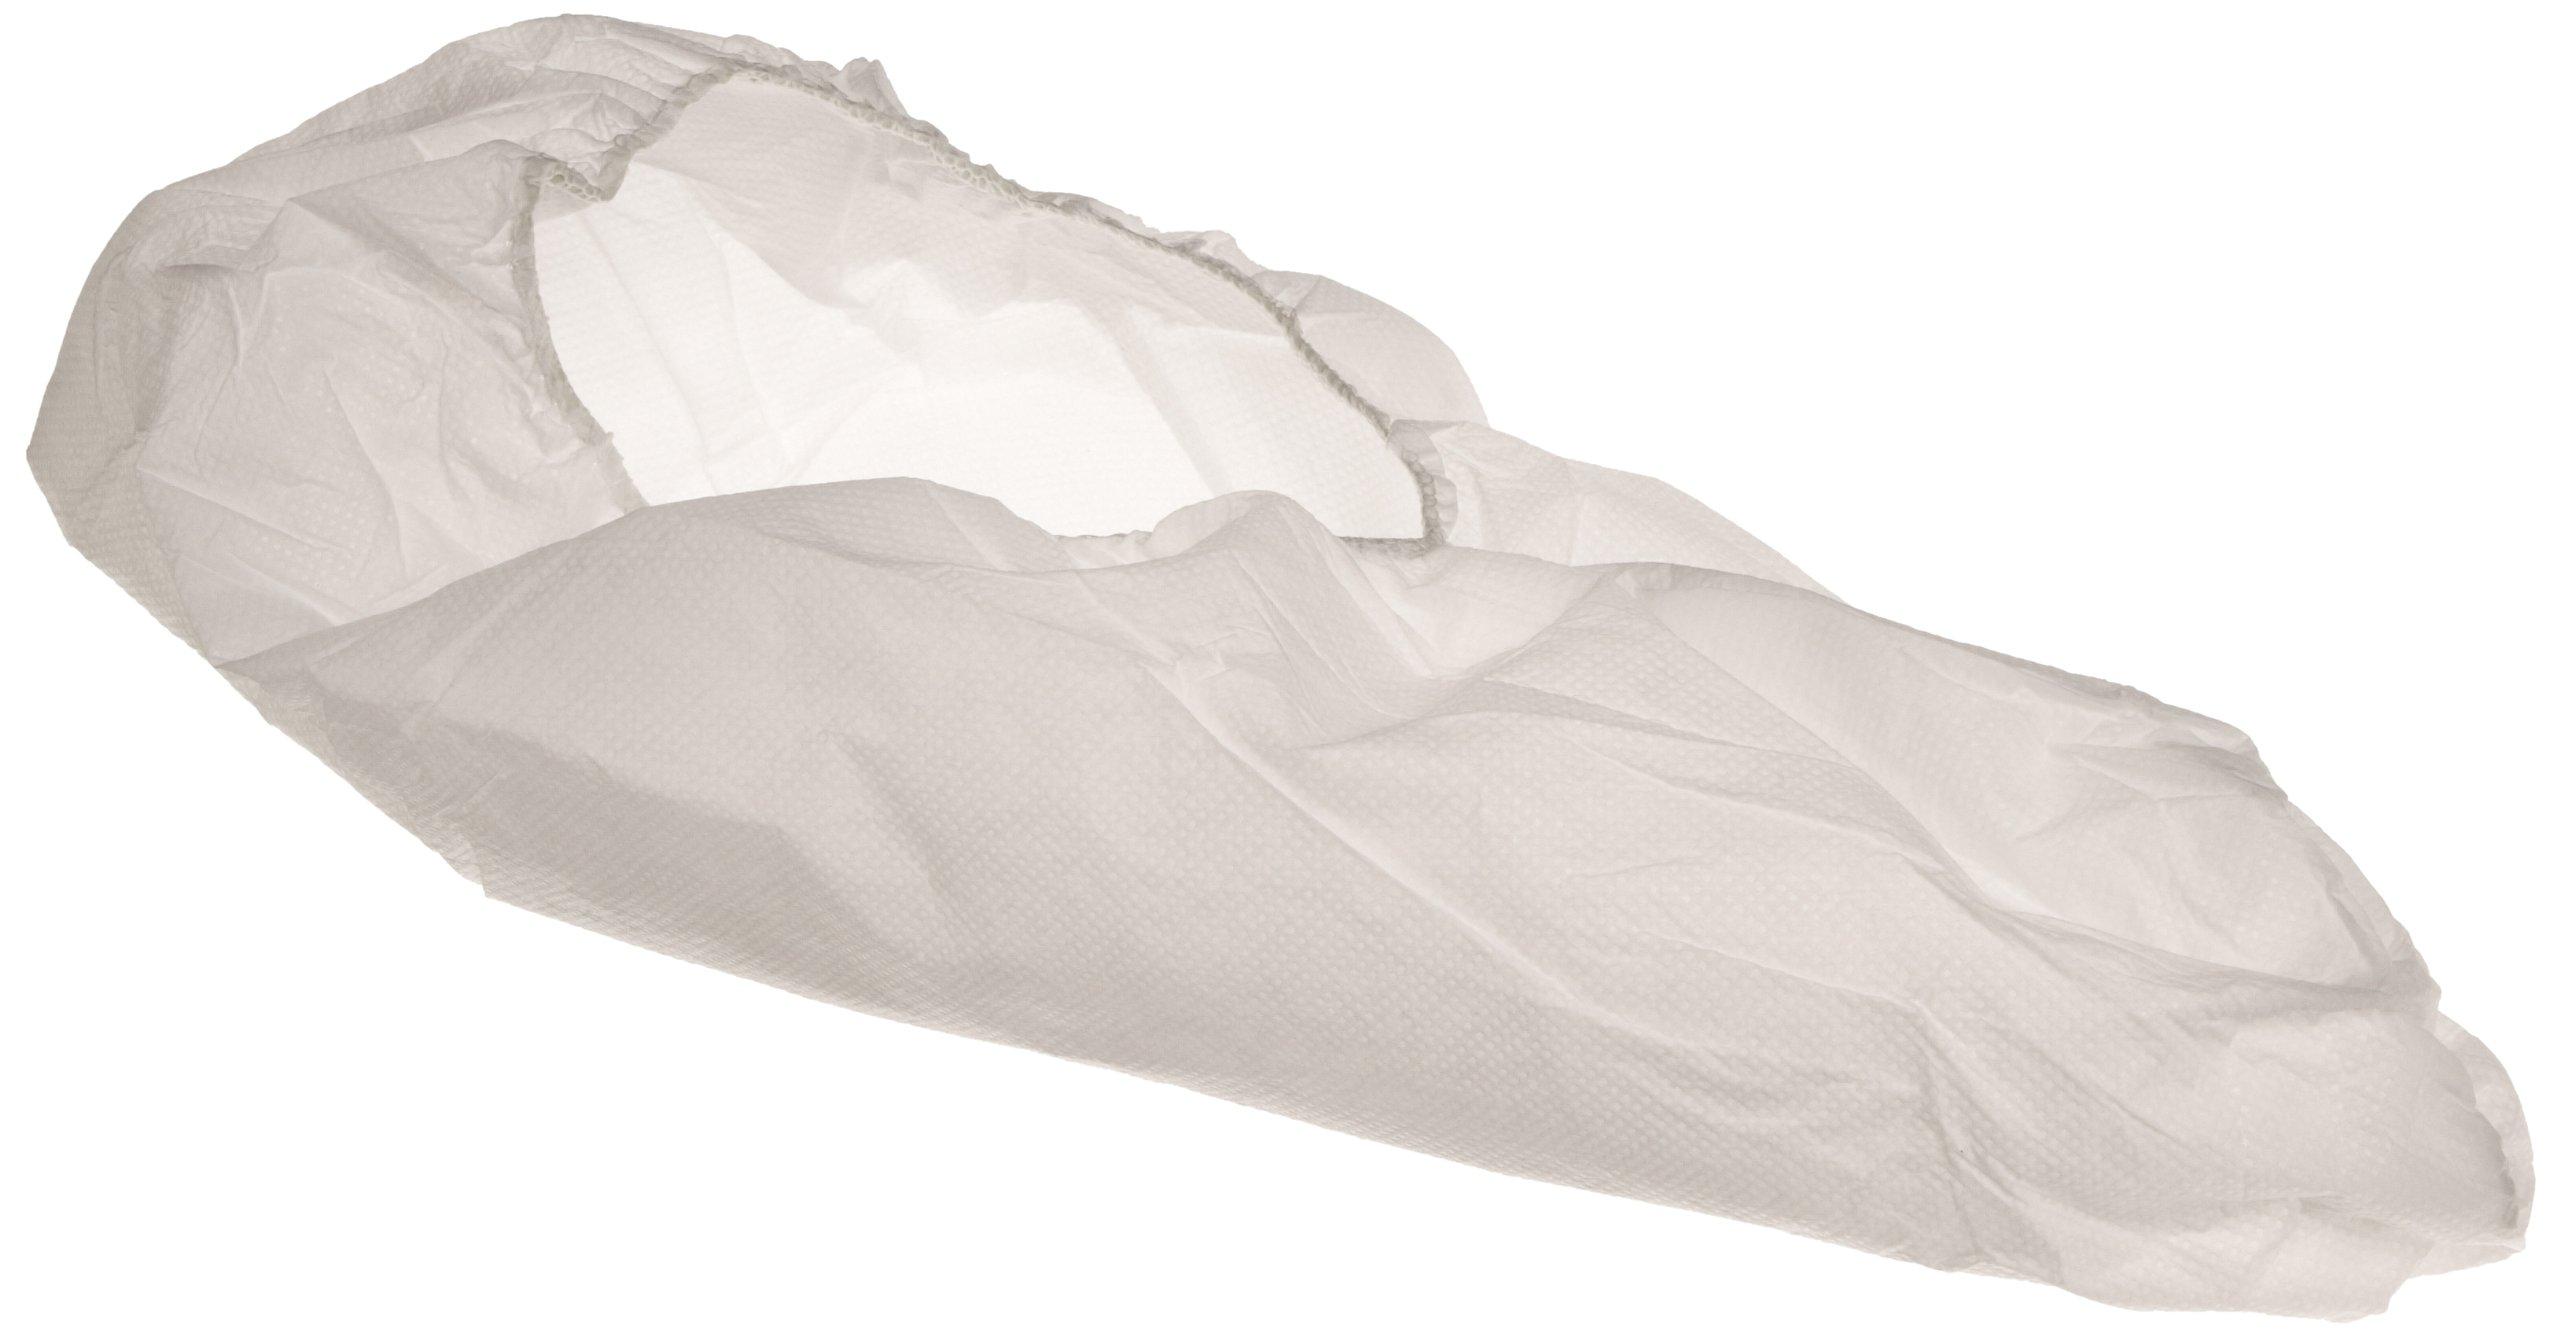 Keystone SC-SS-LG Polypropylene Super Sticky Shoe Cover with Great Non-Skid Bottom, Large, White (Case of 300) by Keystone (Image #1)